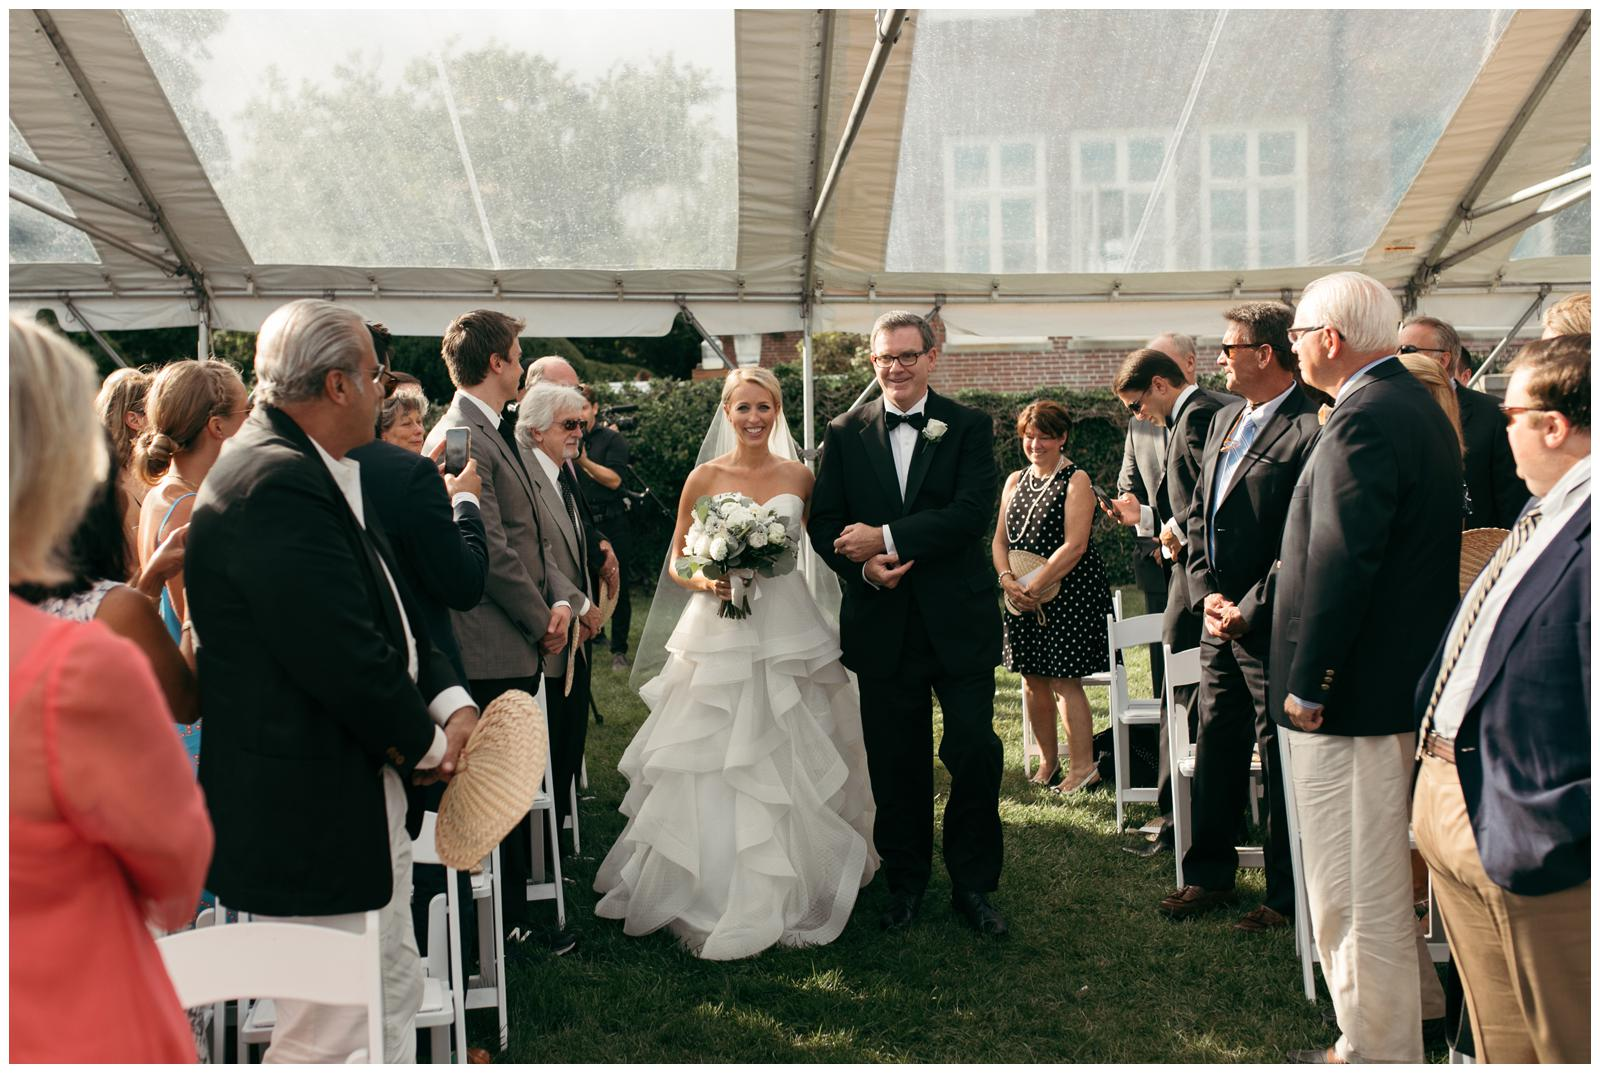 Misselwood wedding rain plan